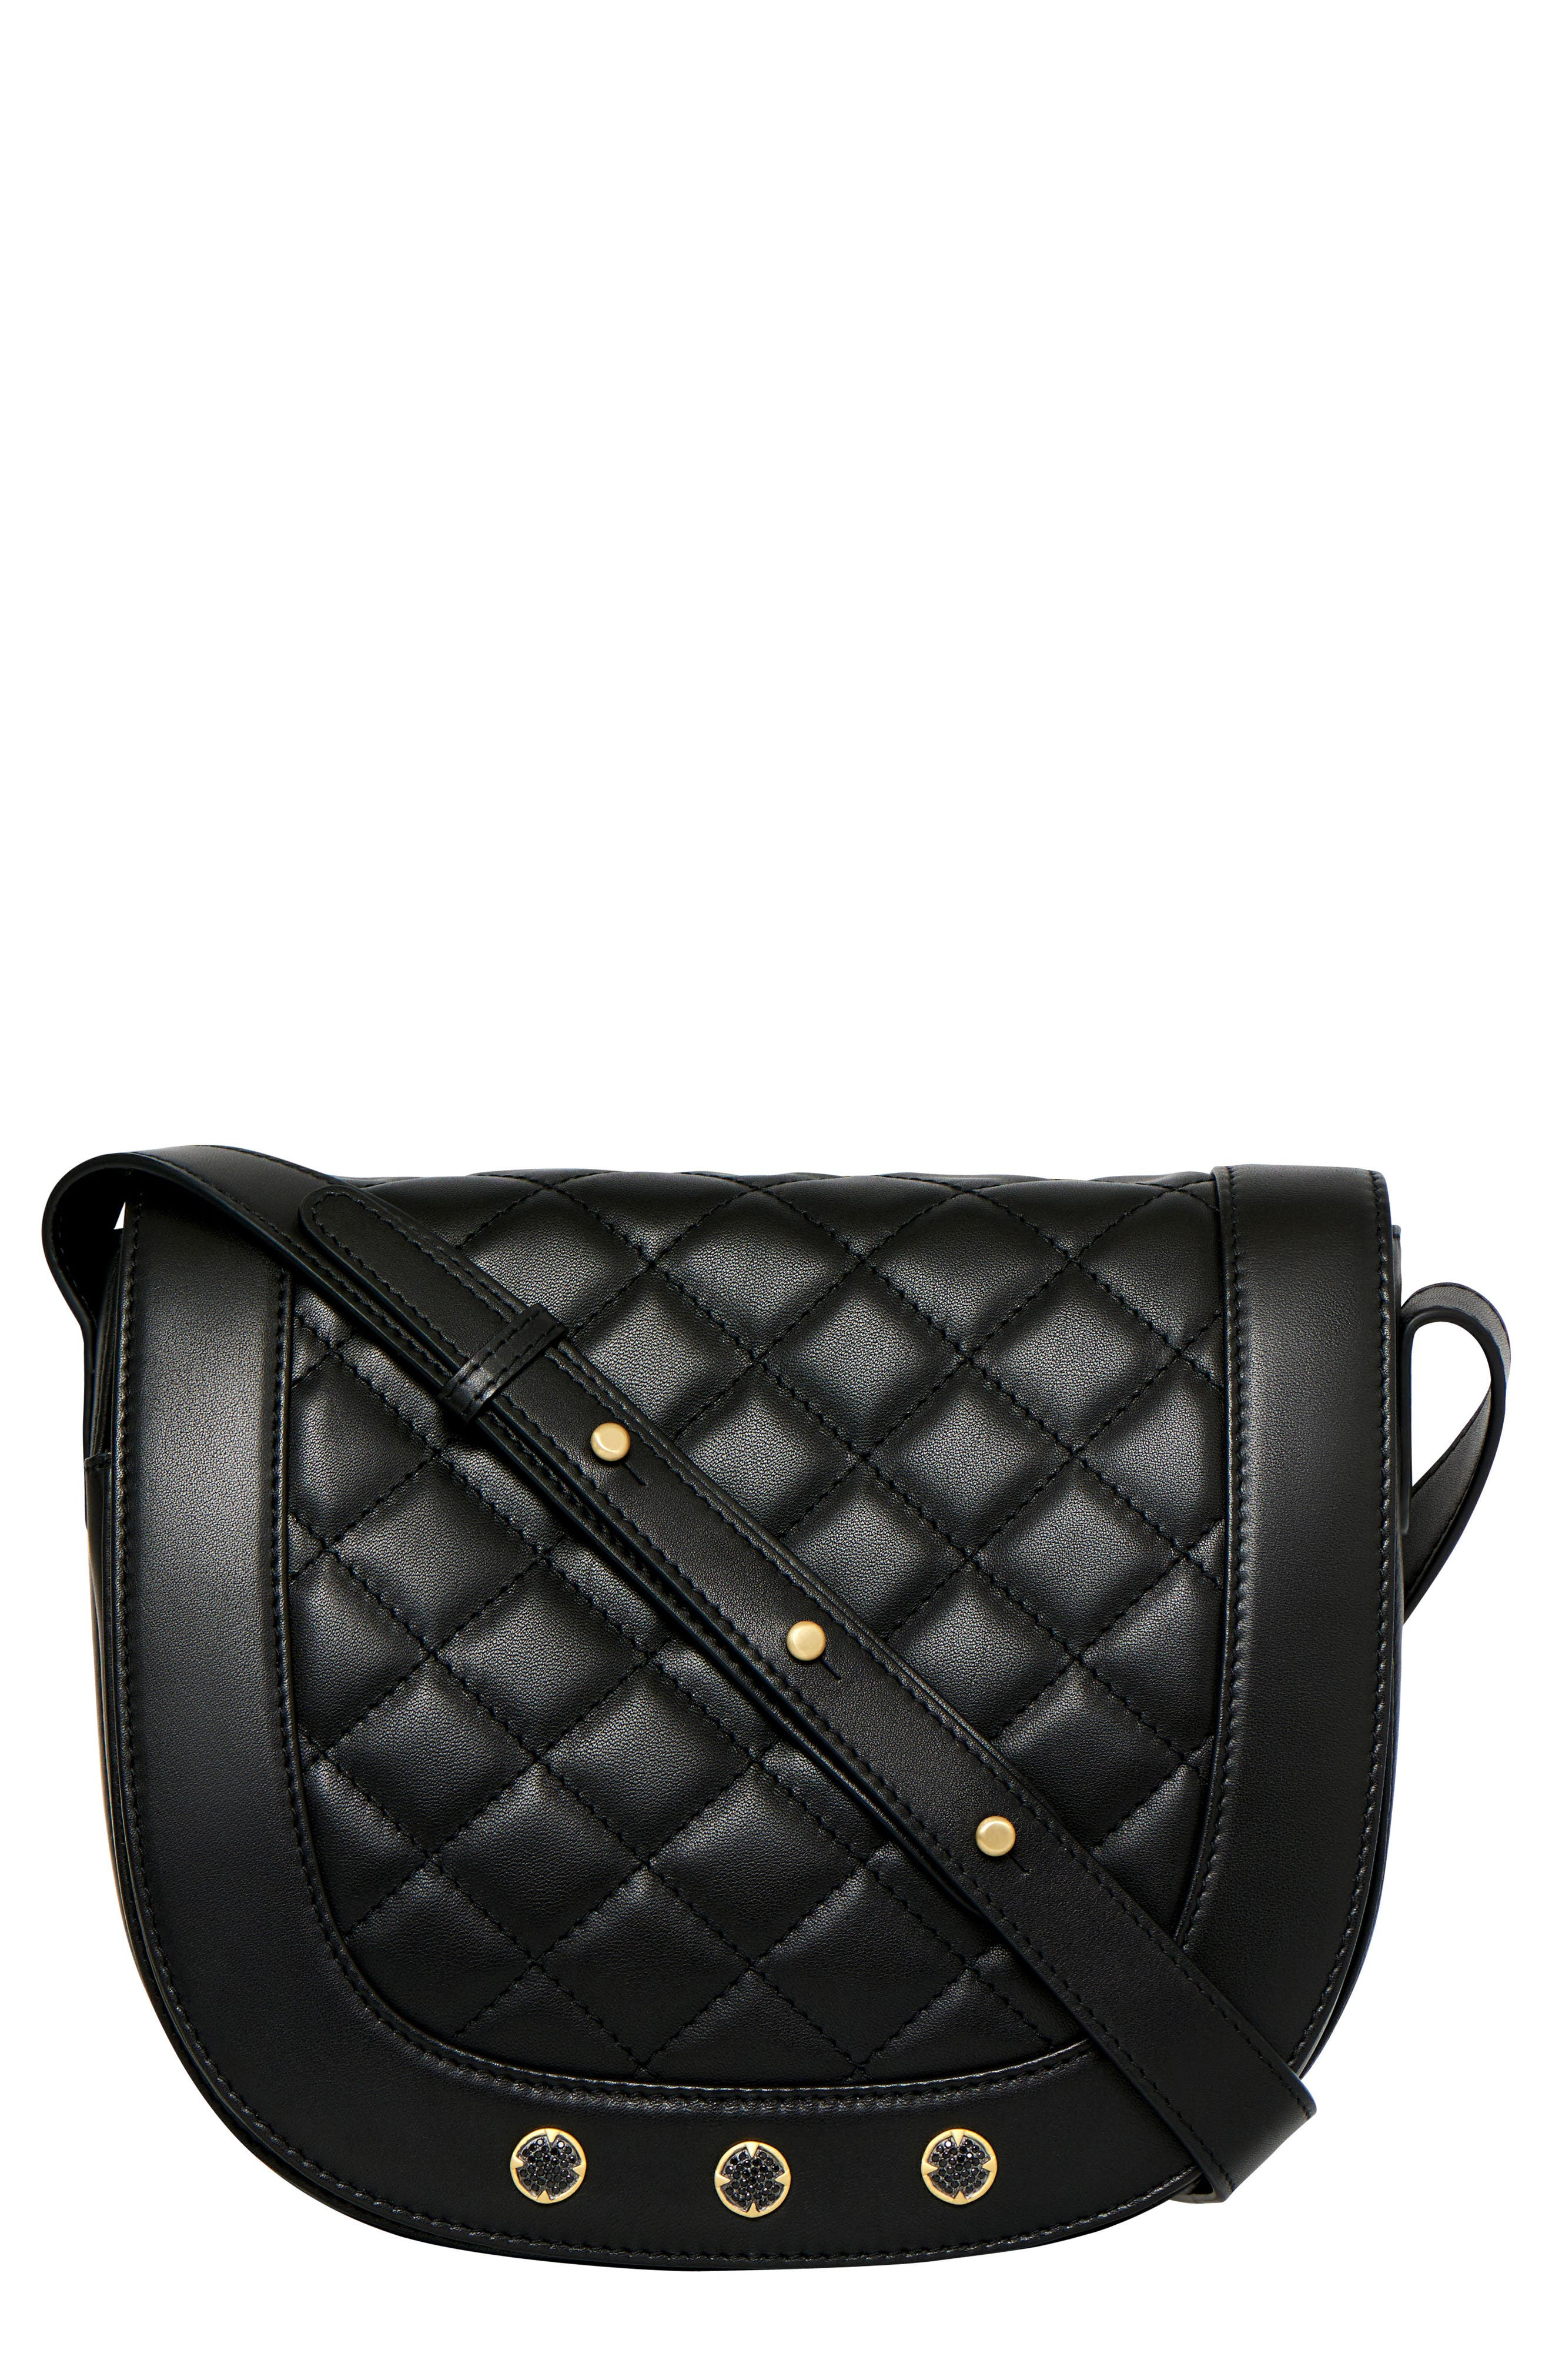 FREIDA ROTHMAN Bleeker Quilted Leather Messenger Bag